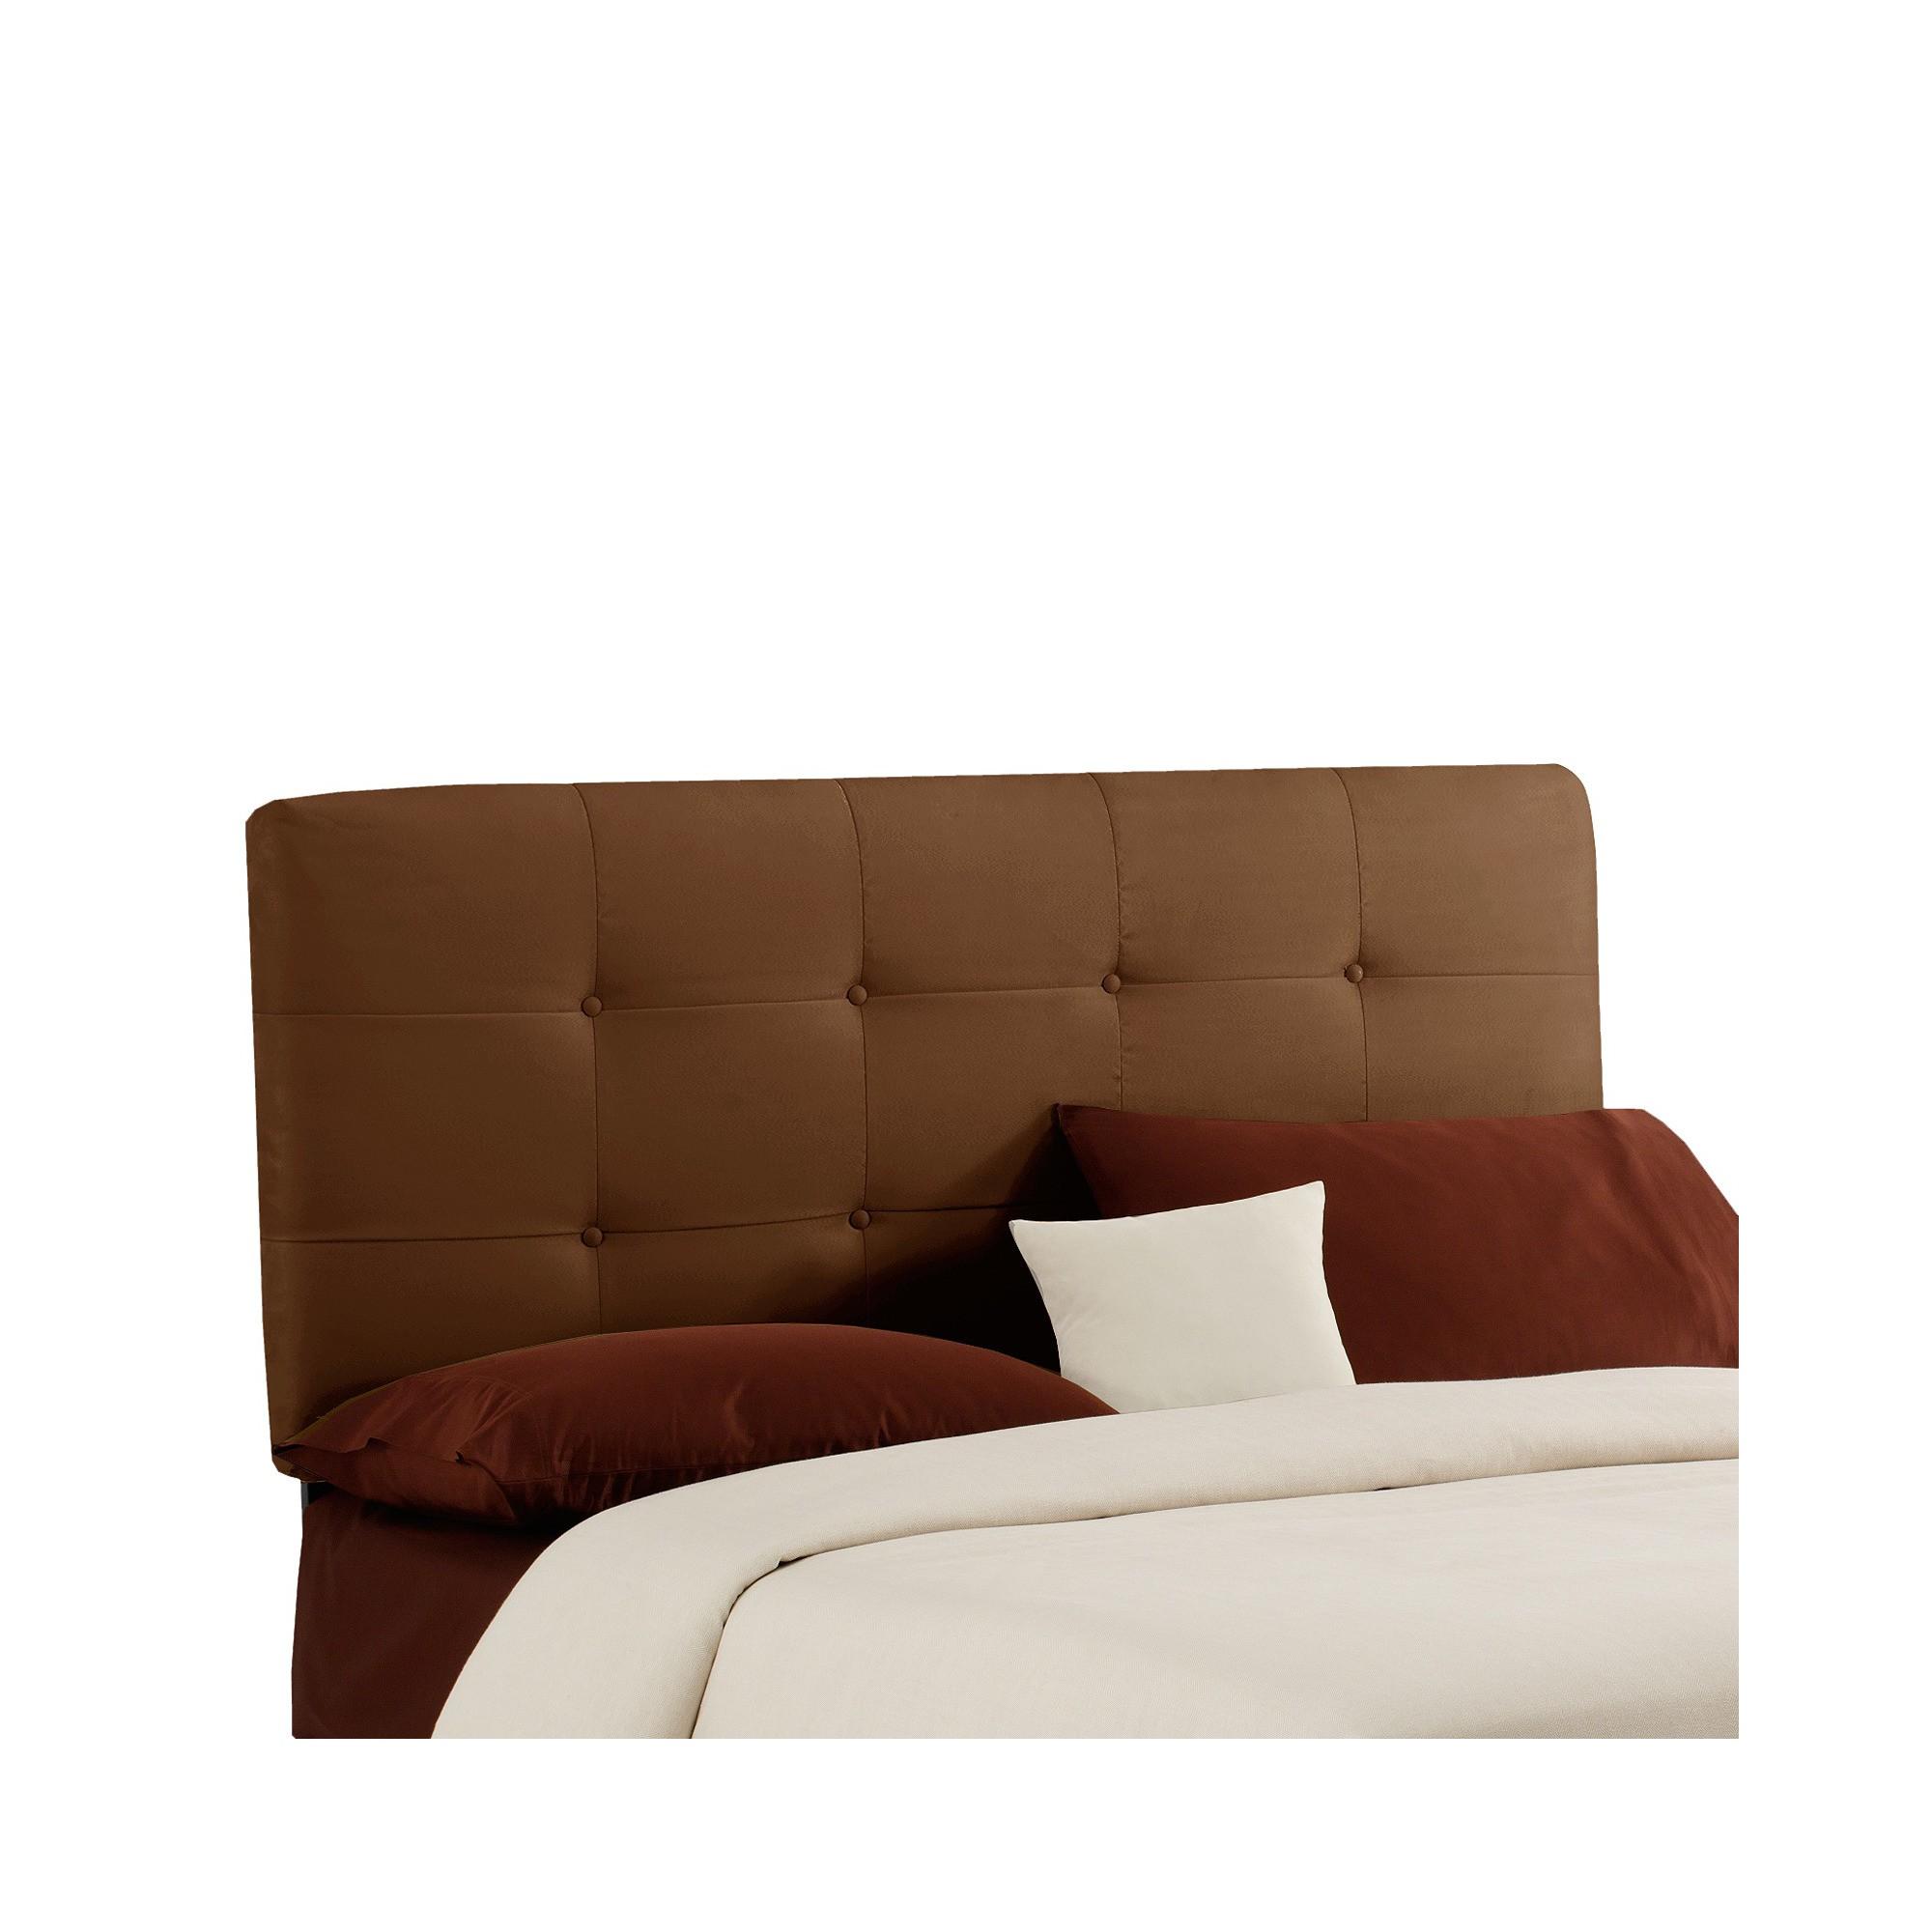 Dolce Microsuede Headboard - Premier Chocolate - Full - Skyline Furniture , Premier Brown